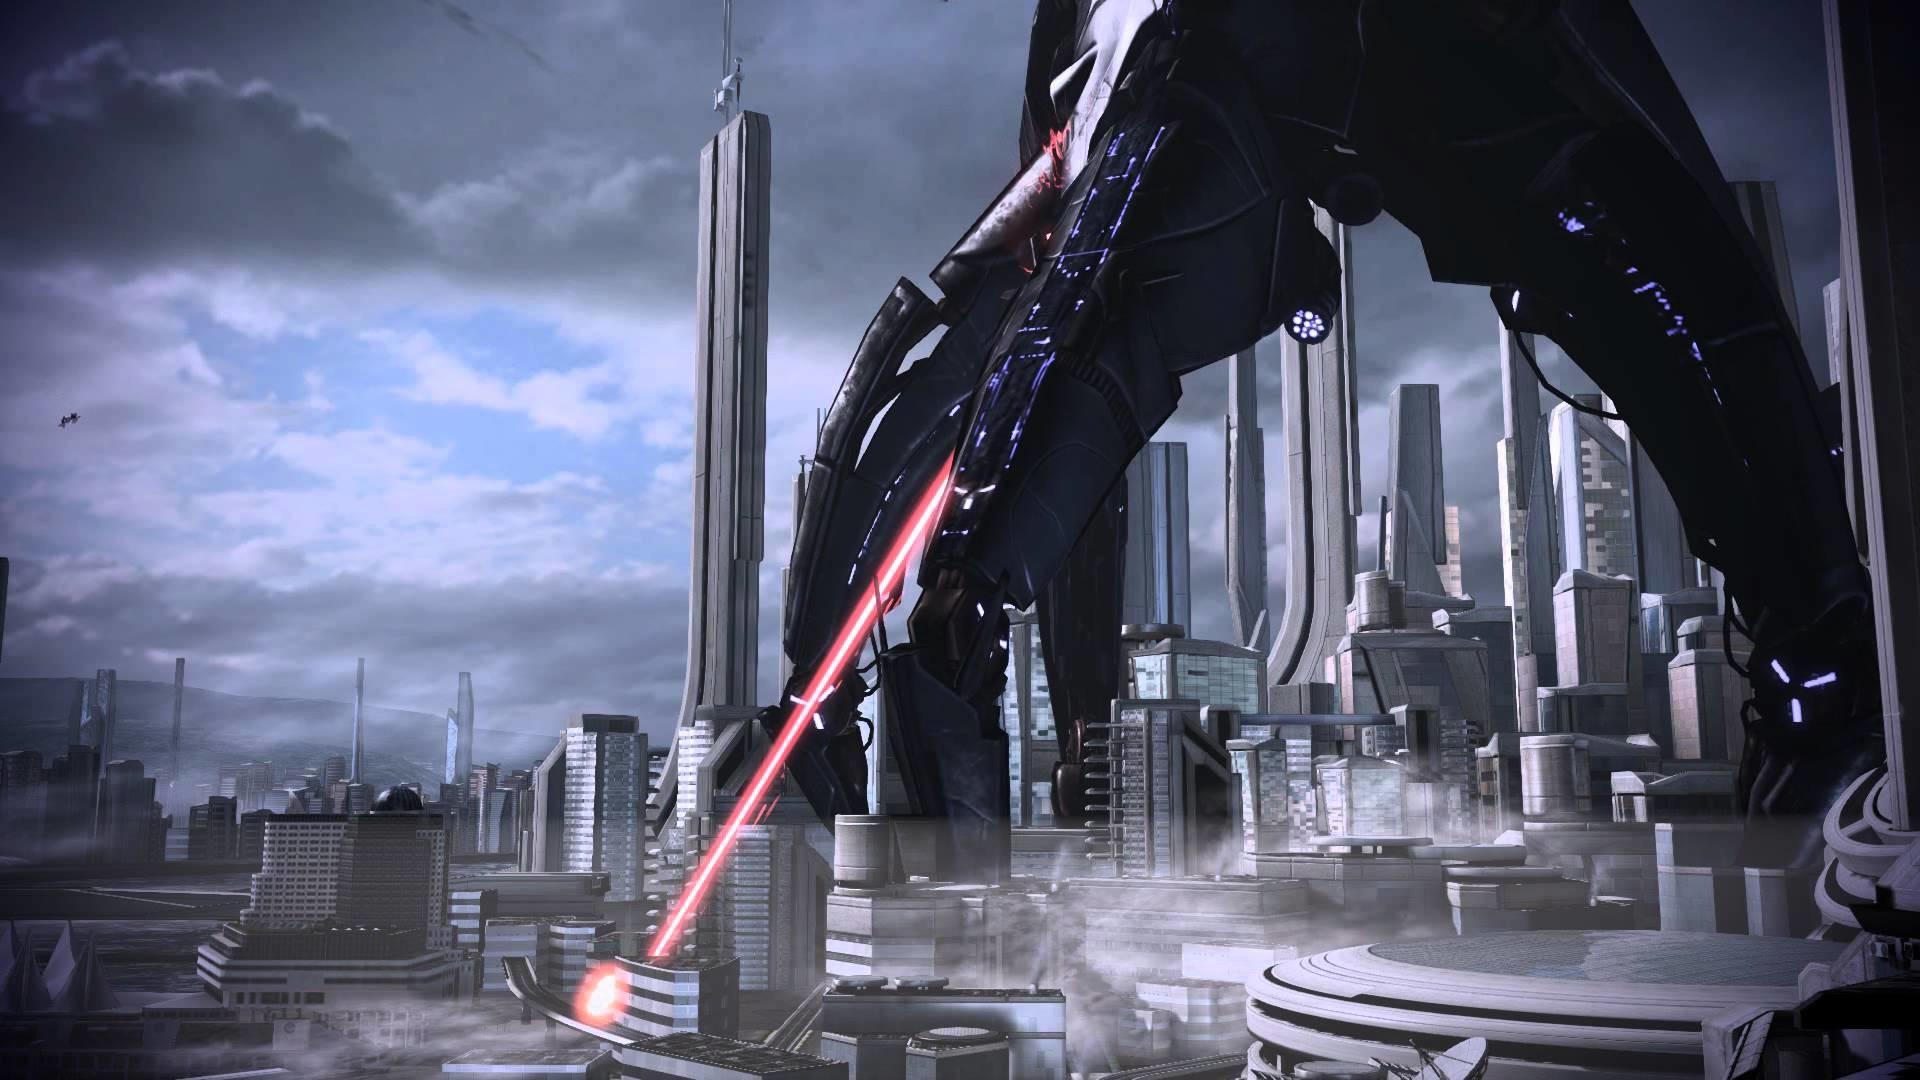 Mass Effect 3 Earth Vancouver Reaper Dreamscene Video Wallpaper – YouTube